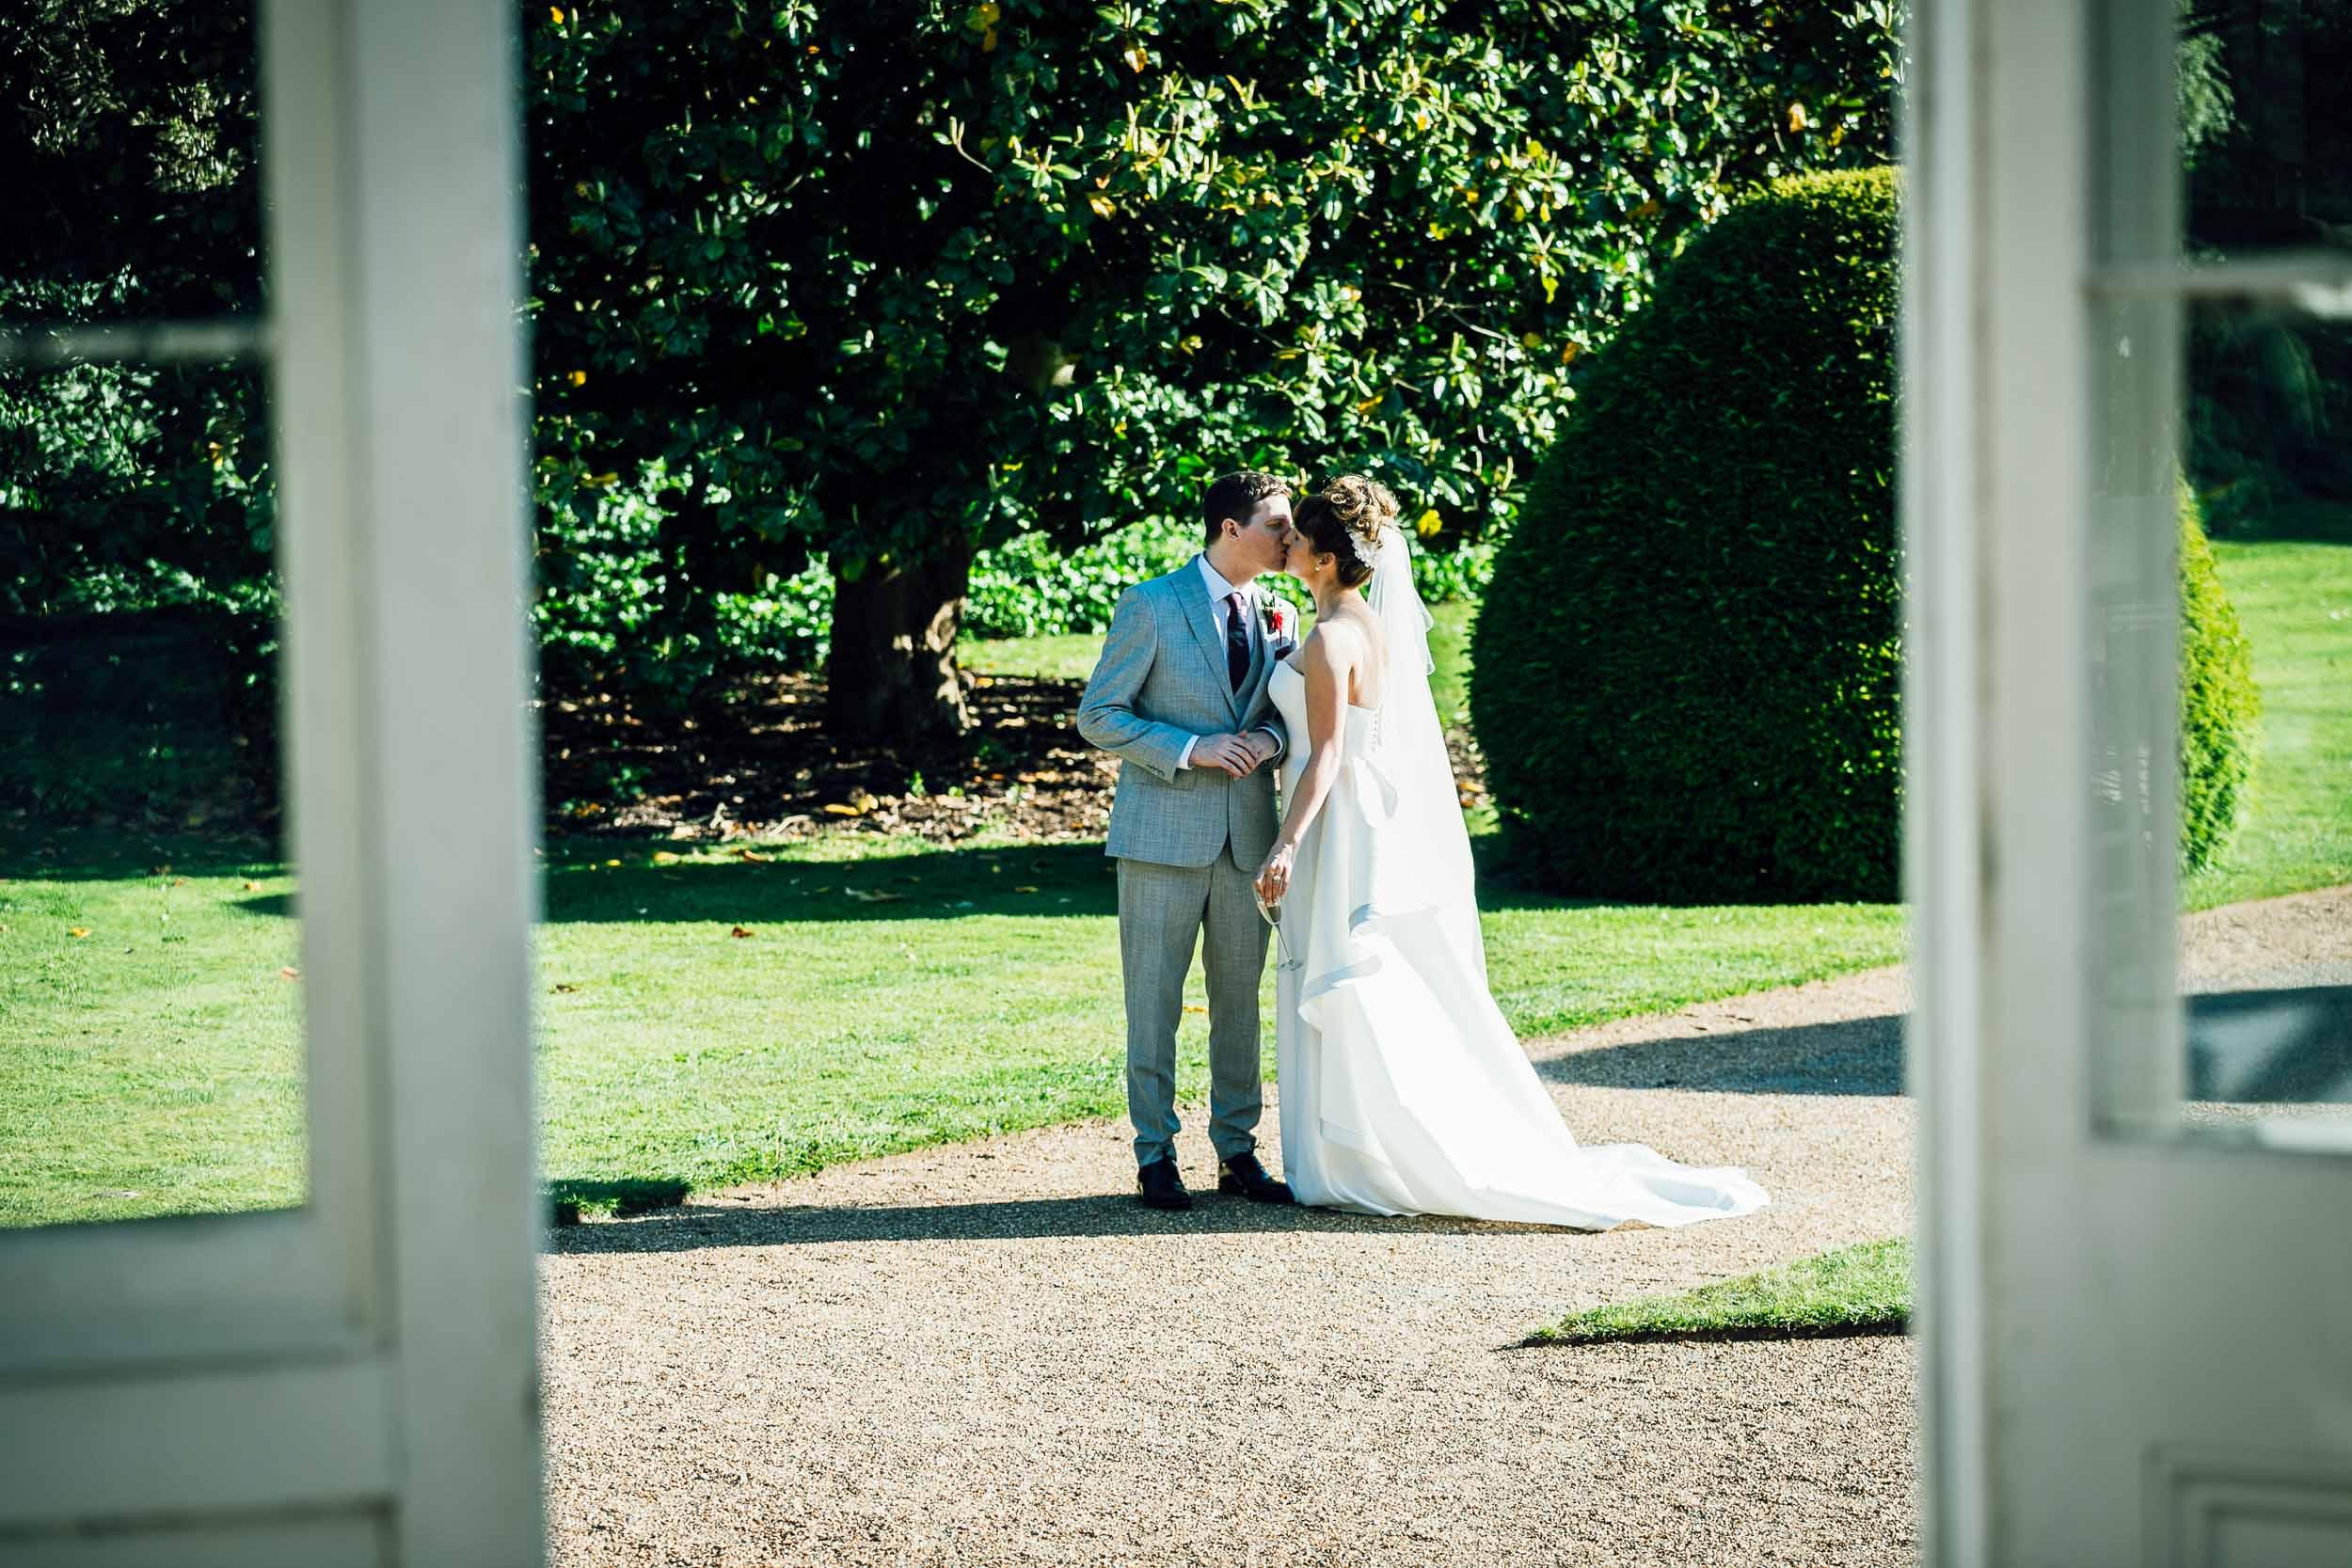 syon-house-wedding-photographer-london 119.jpg